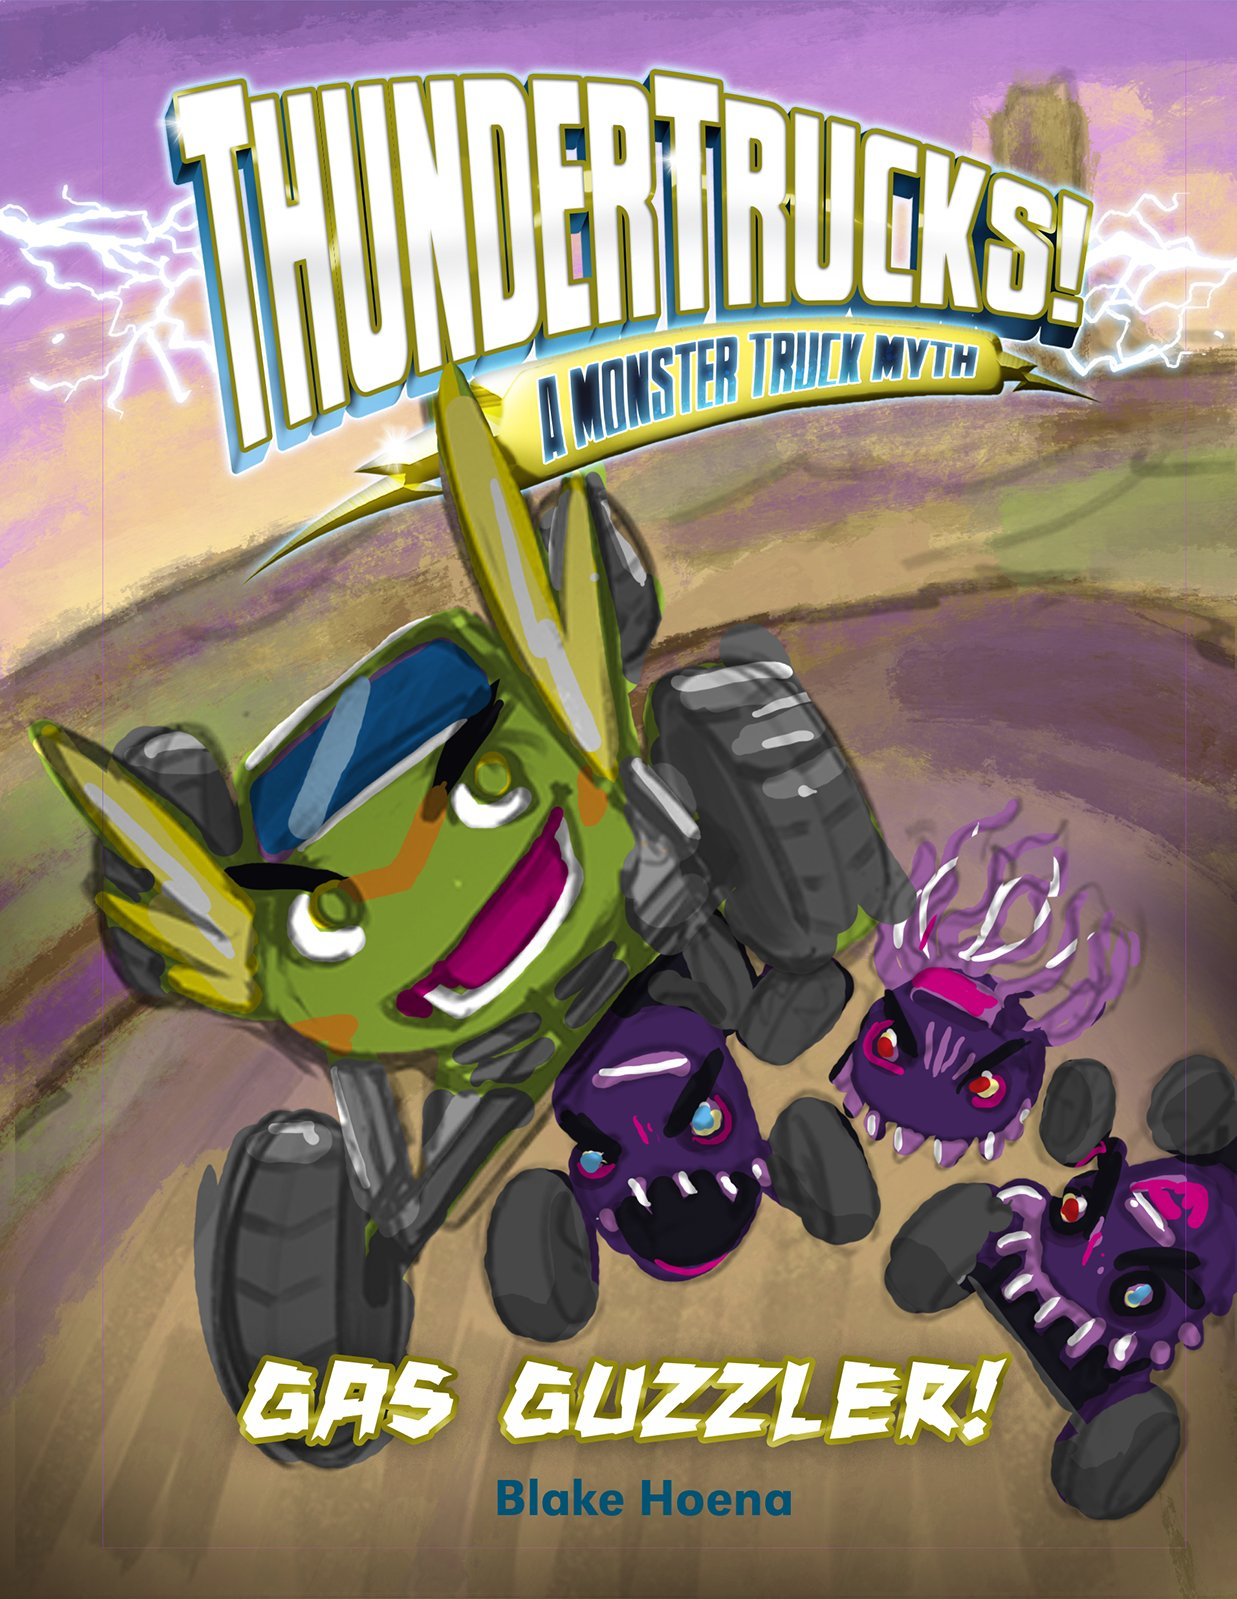 Gas Guzzler!: A Monster Truck Myth (ThunderTrucks!)